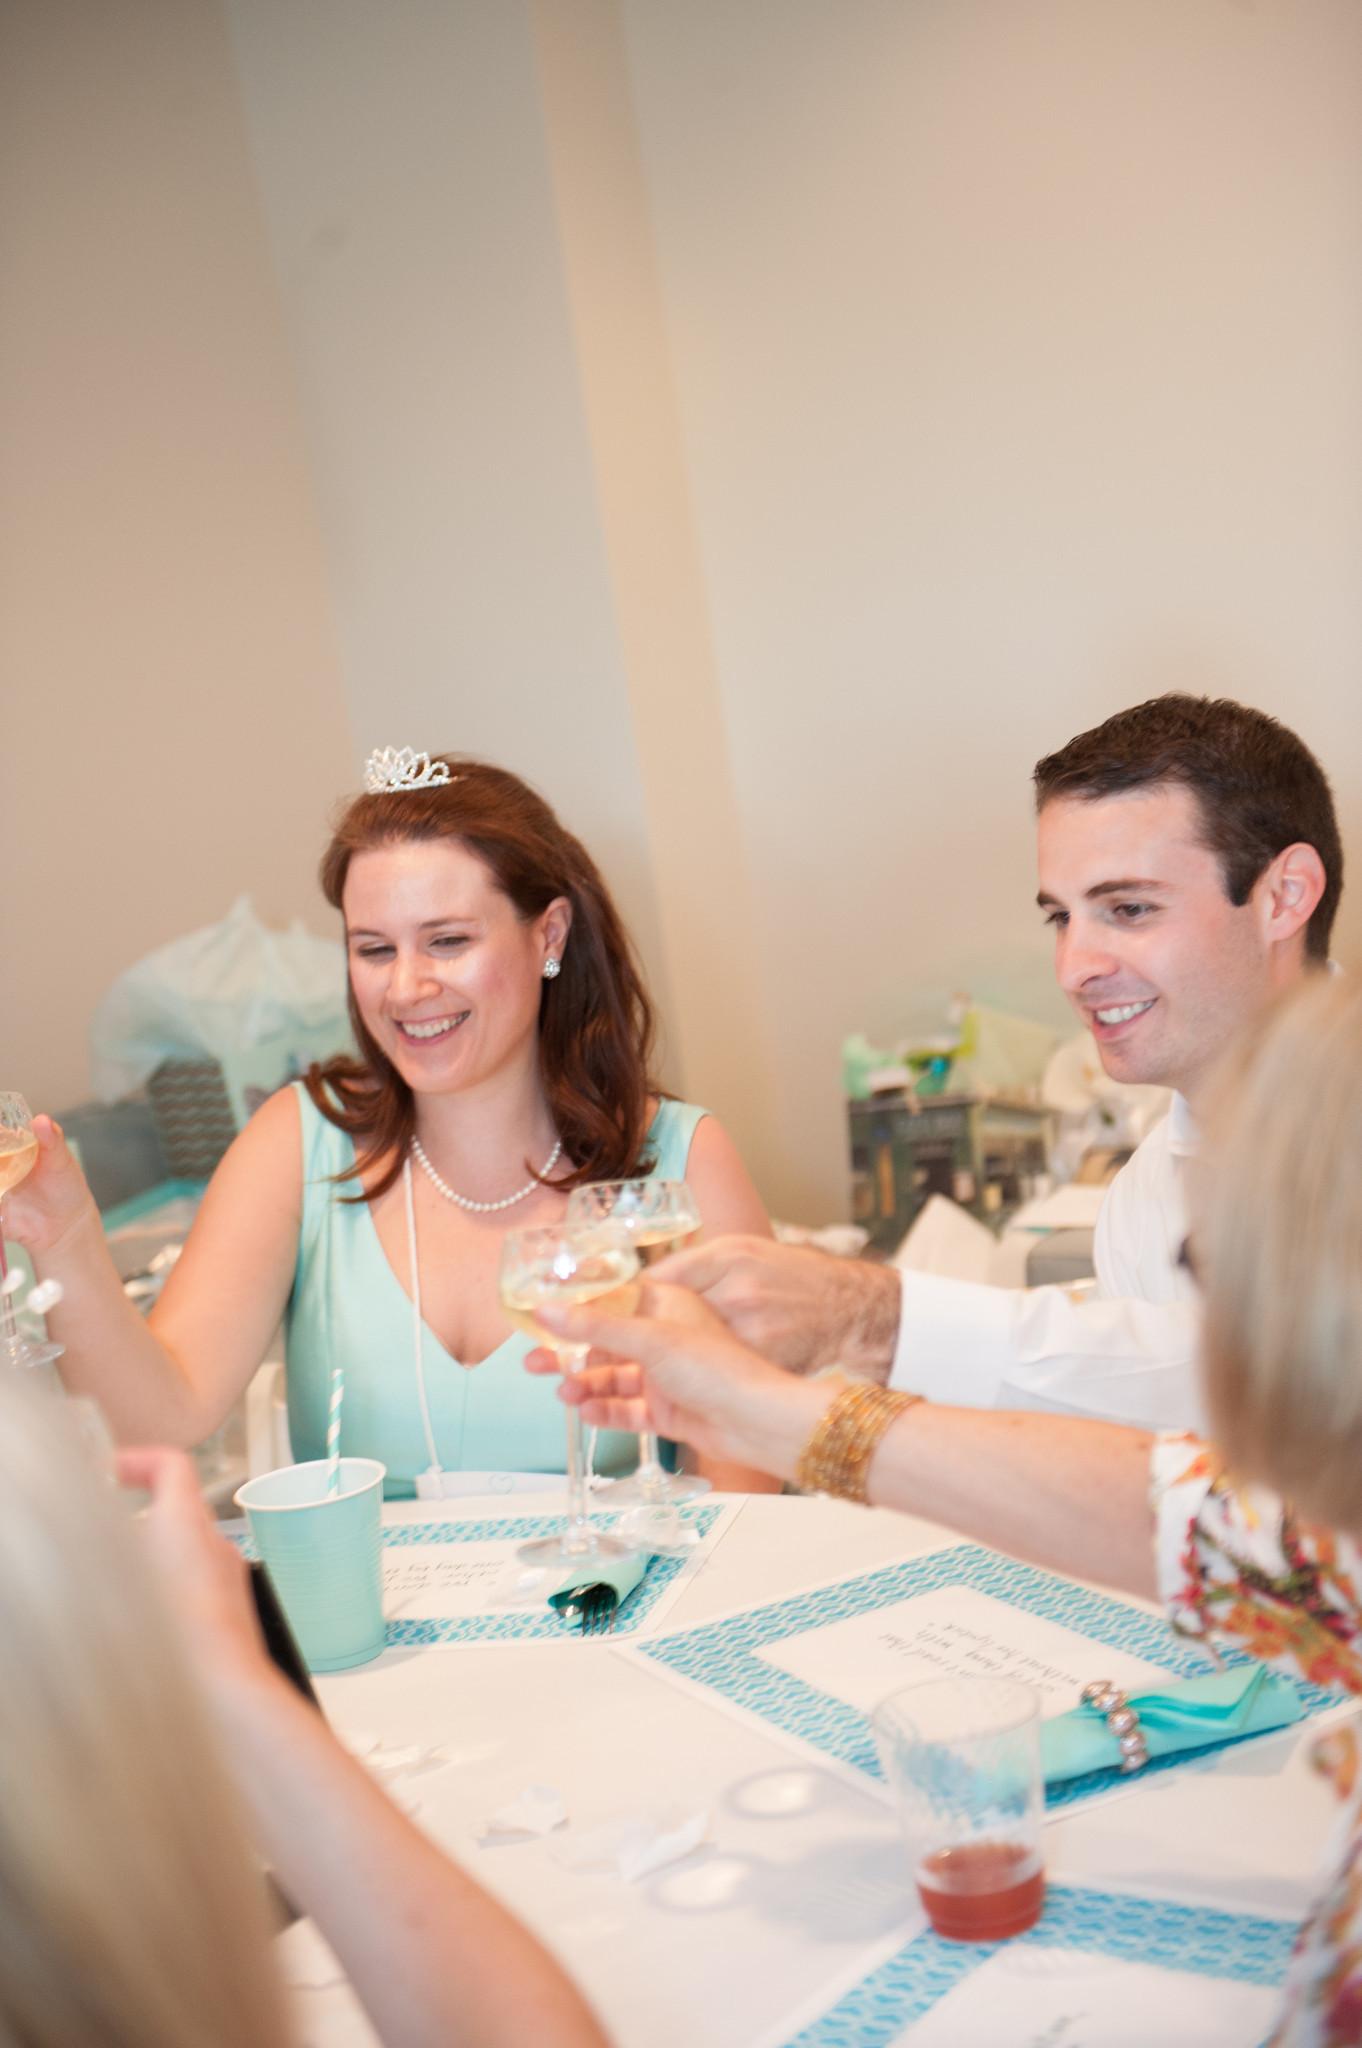 Wedding Savvy Who Should Host A Bridal Shower